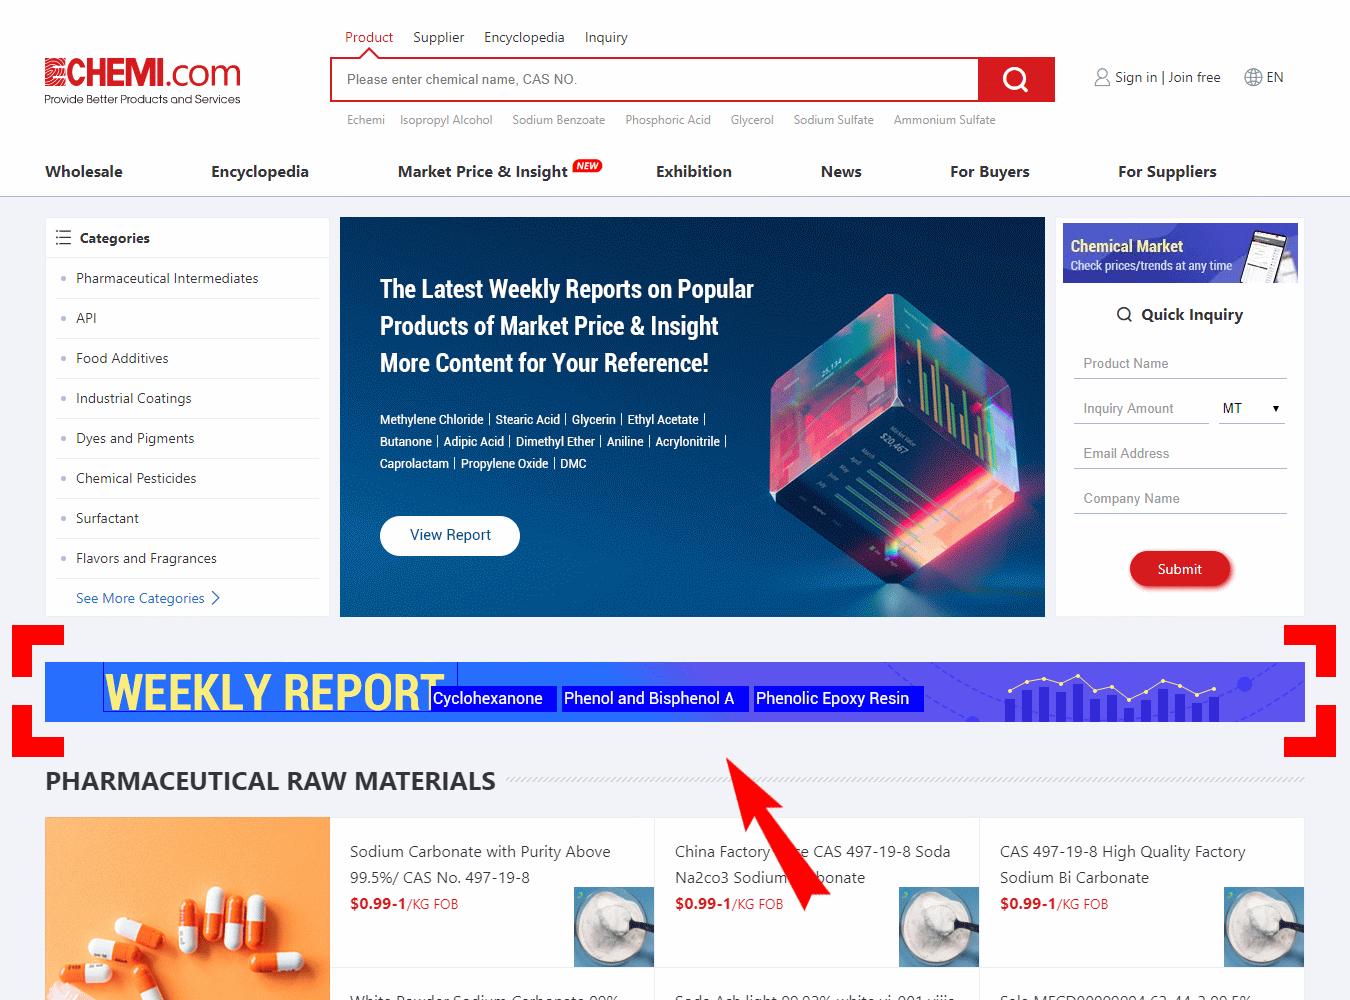 Homepage A2 display